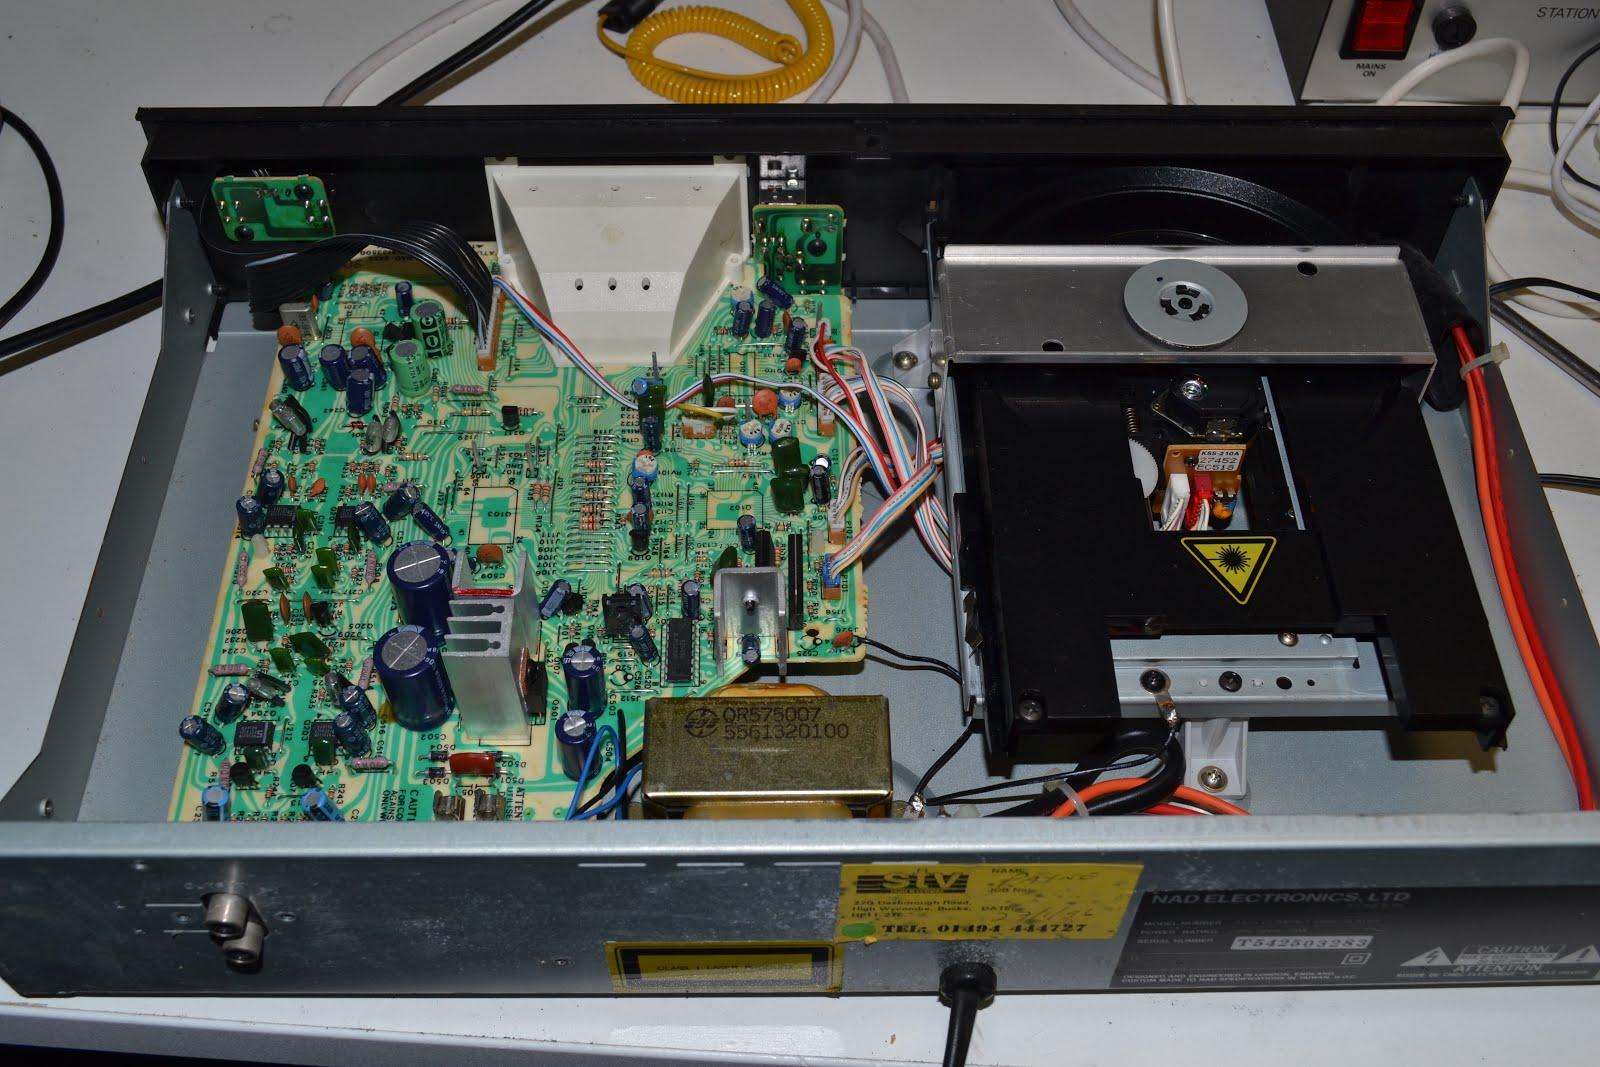 Doz' Blog: NAD 5425 CD player - no display